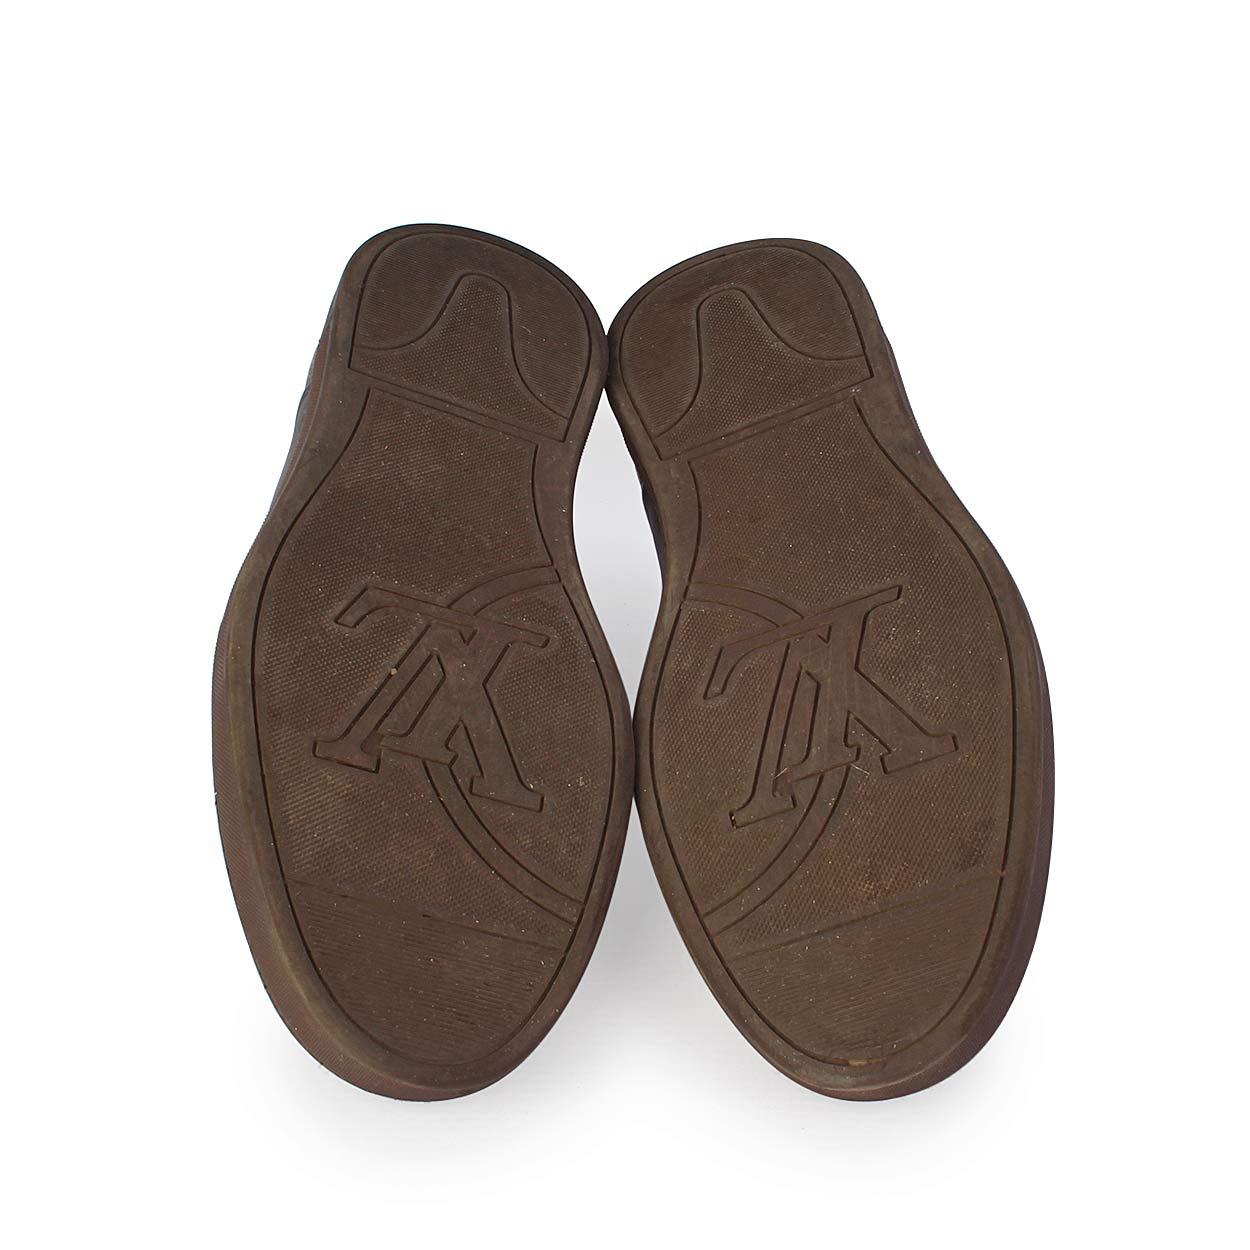 LOUIS VUITTON Monogram Line-Up Sneakers